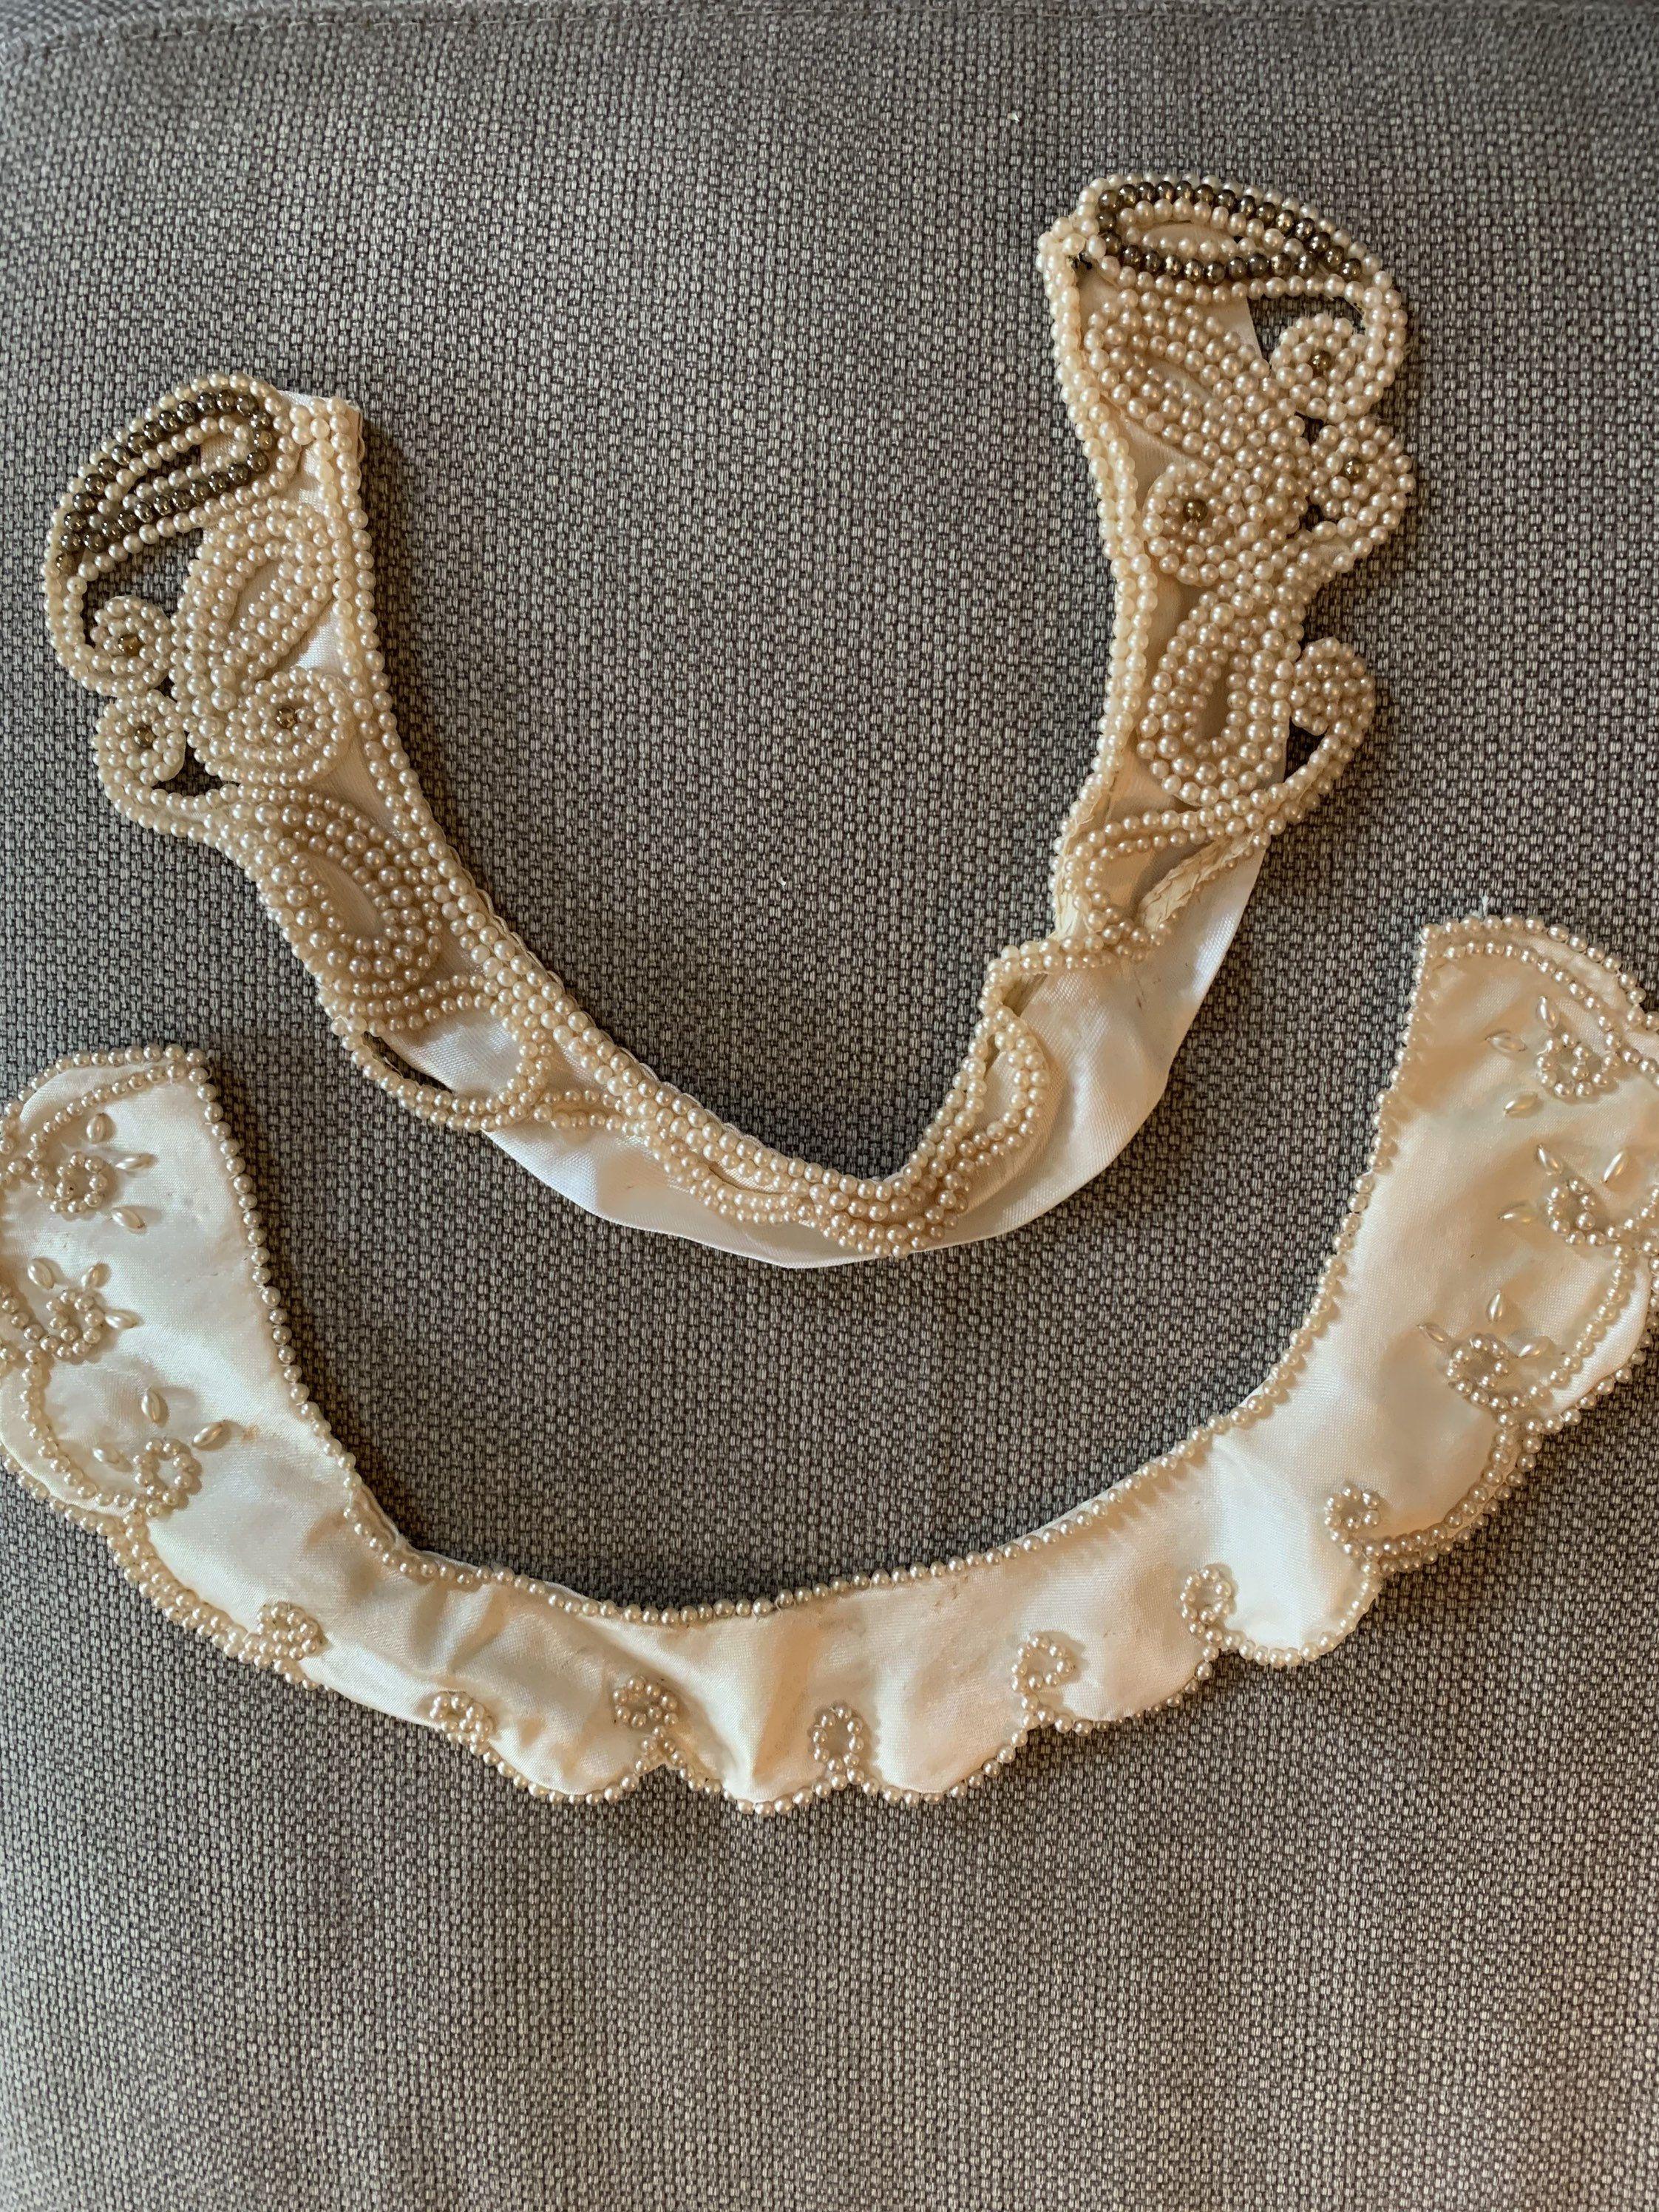 Two Vintage Pearl Rbg Collars Etsy In 2020 Etsy Vintage Vintage Pearls Vintage